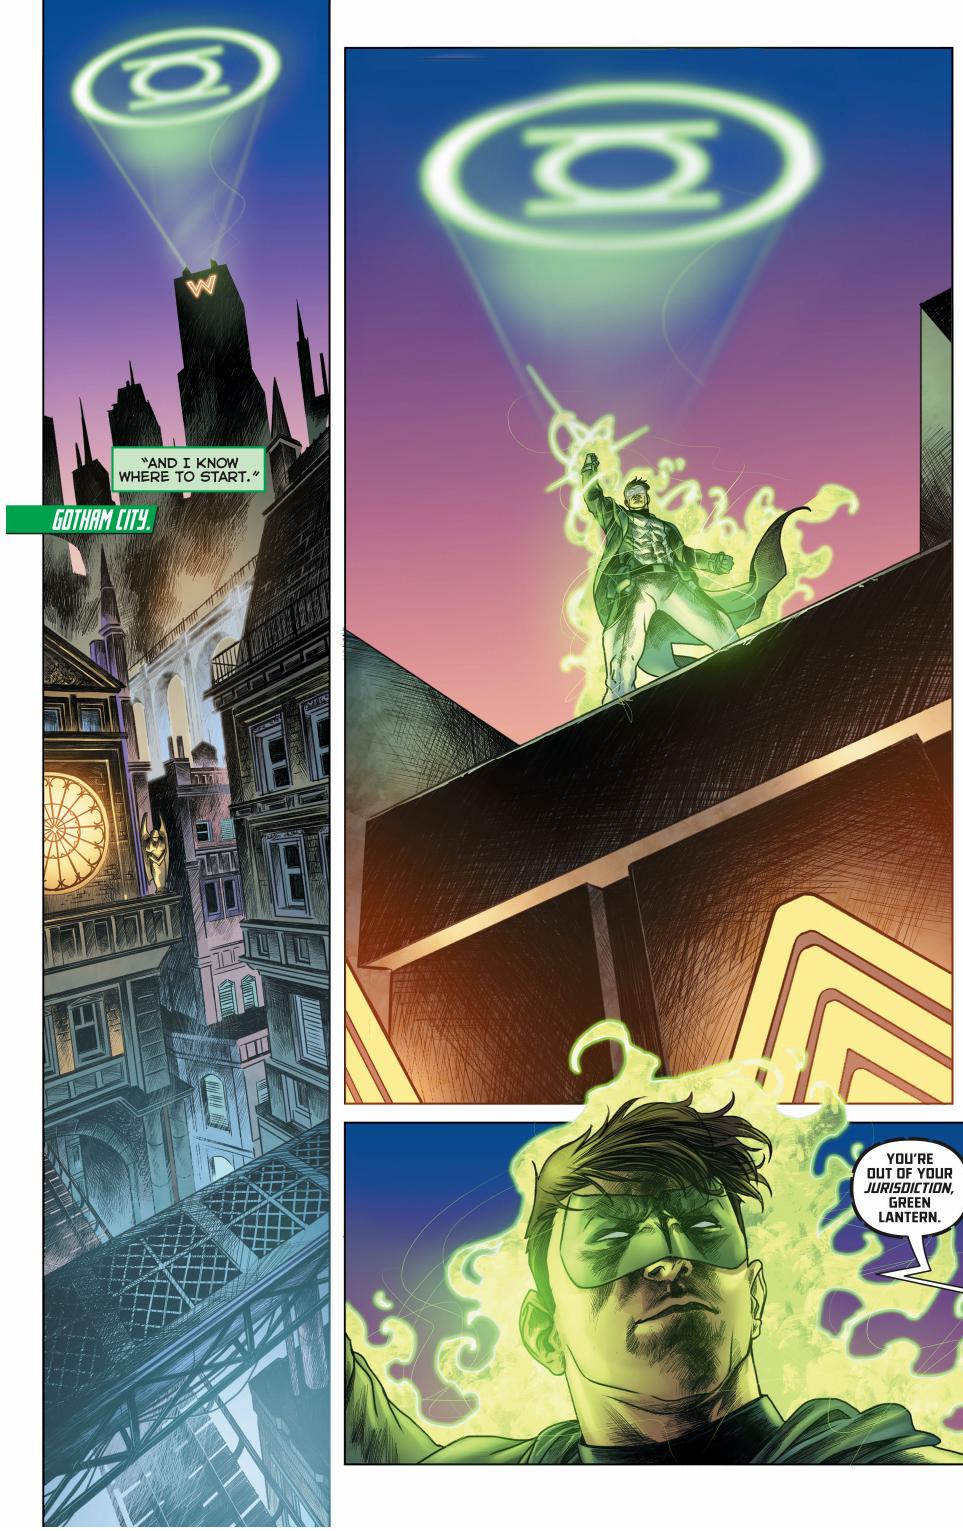 green lantern's (hal jordan) first meeting with batman (jim gordon)